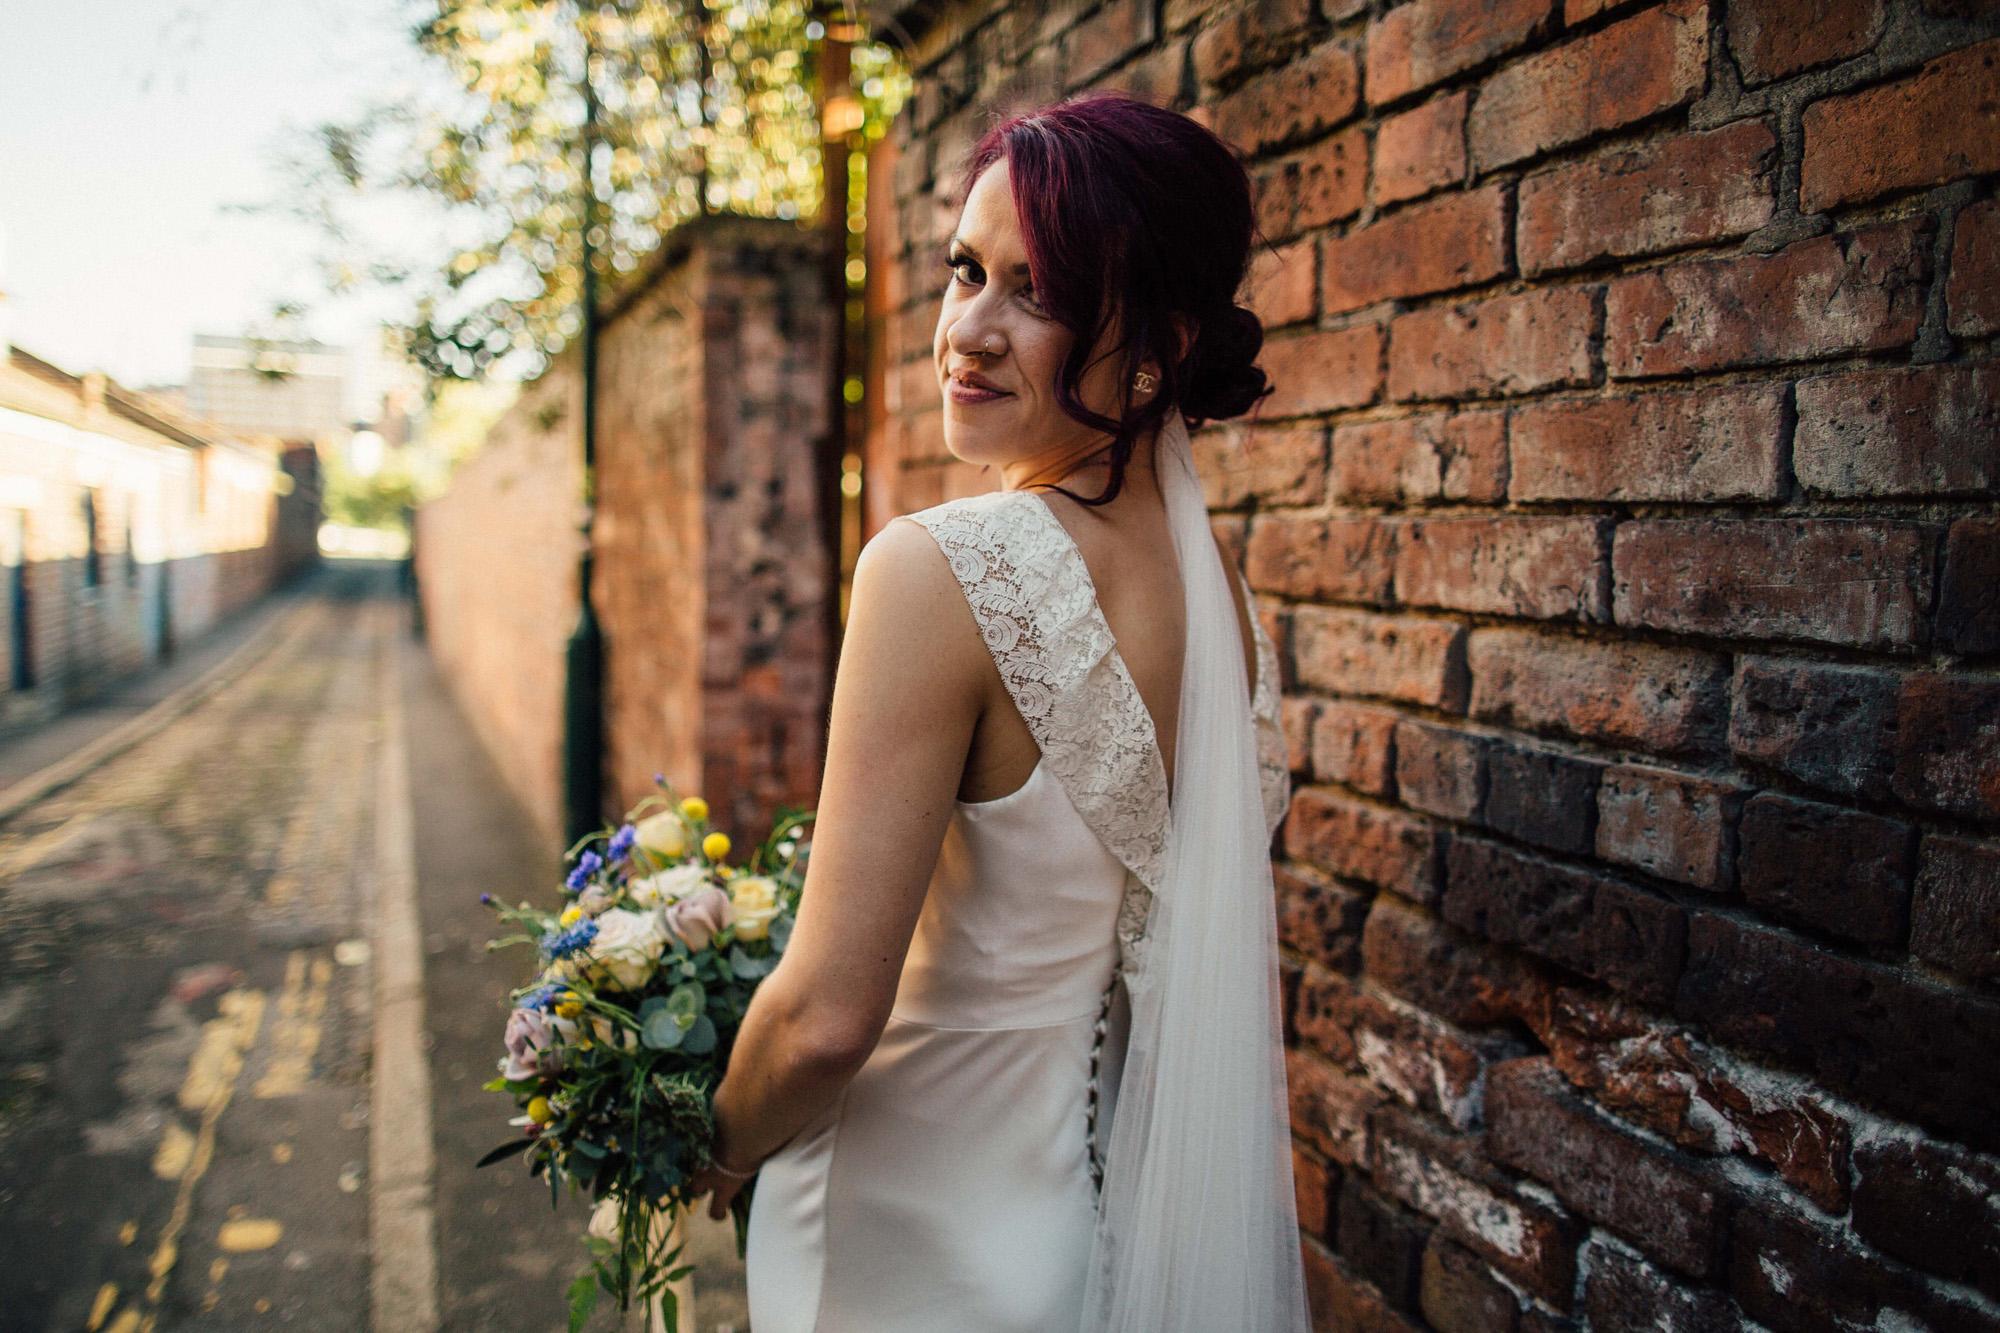 Sarah-Honeysuckle-Bias-Cut-Silk-Vintage-Inspired-Wedding-Gown-Sheffield-Wedding-Kate-Beaumont-60.jpg